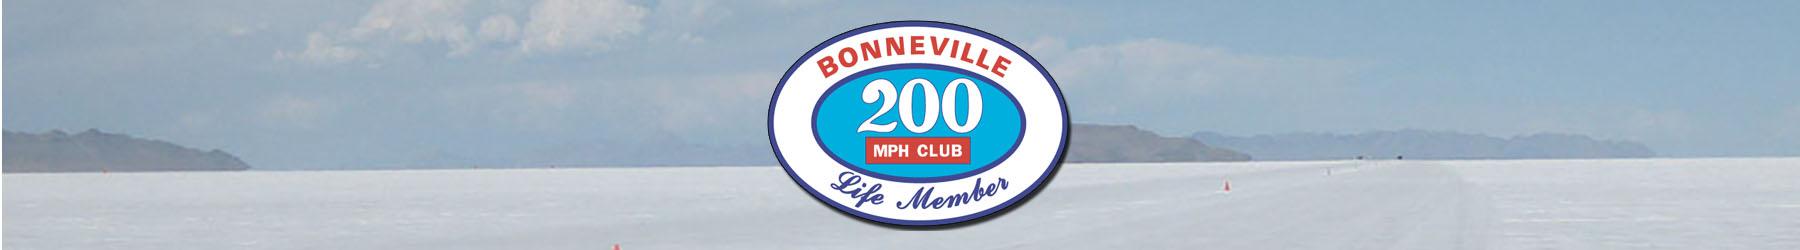 Bonneville200MPHclub